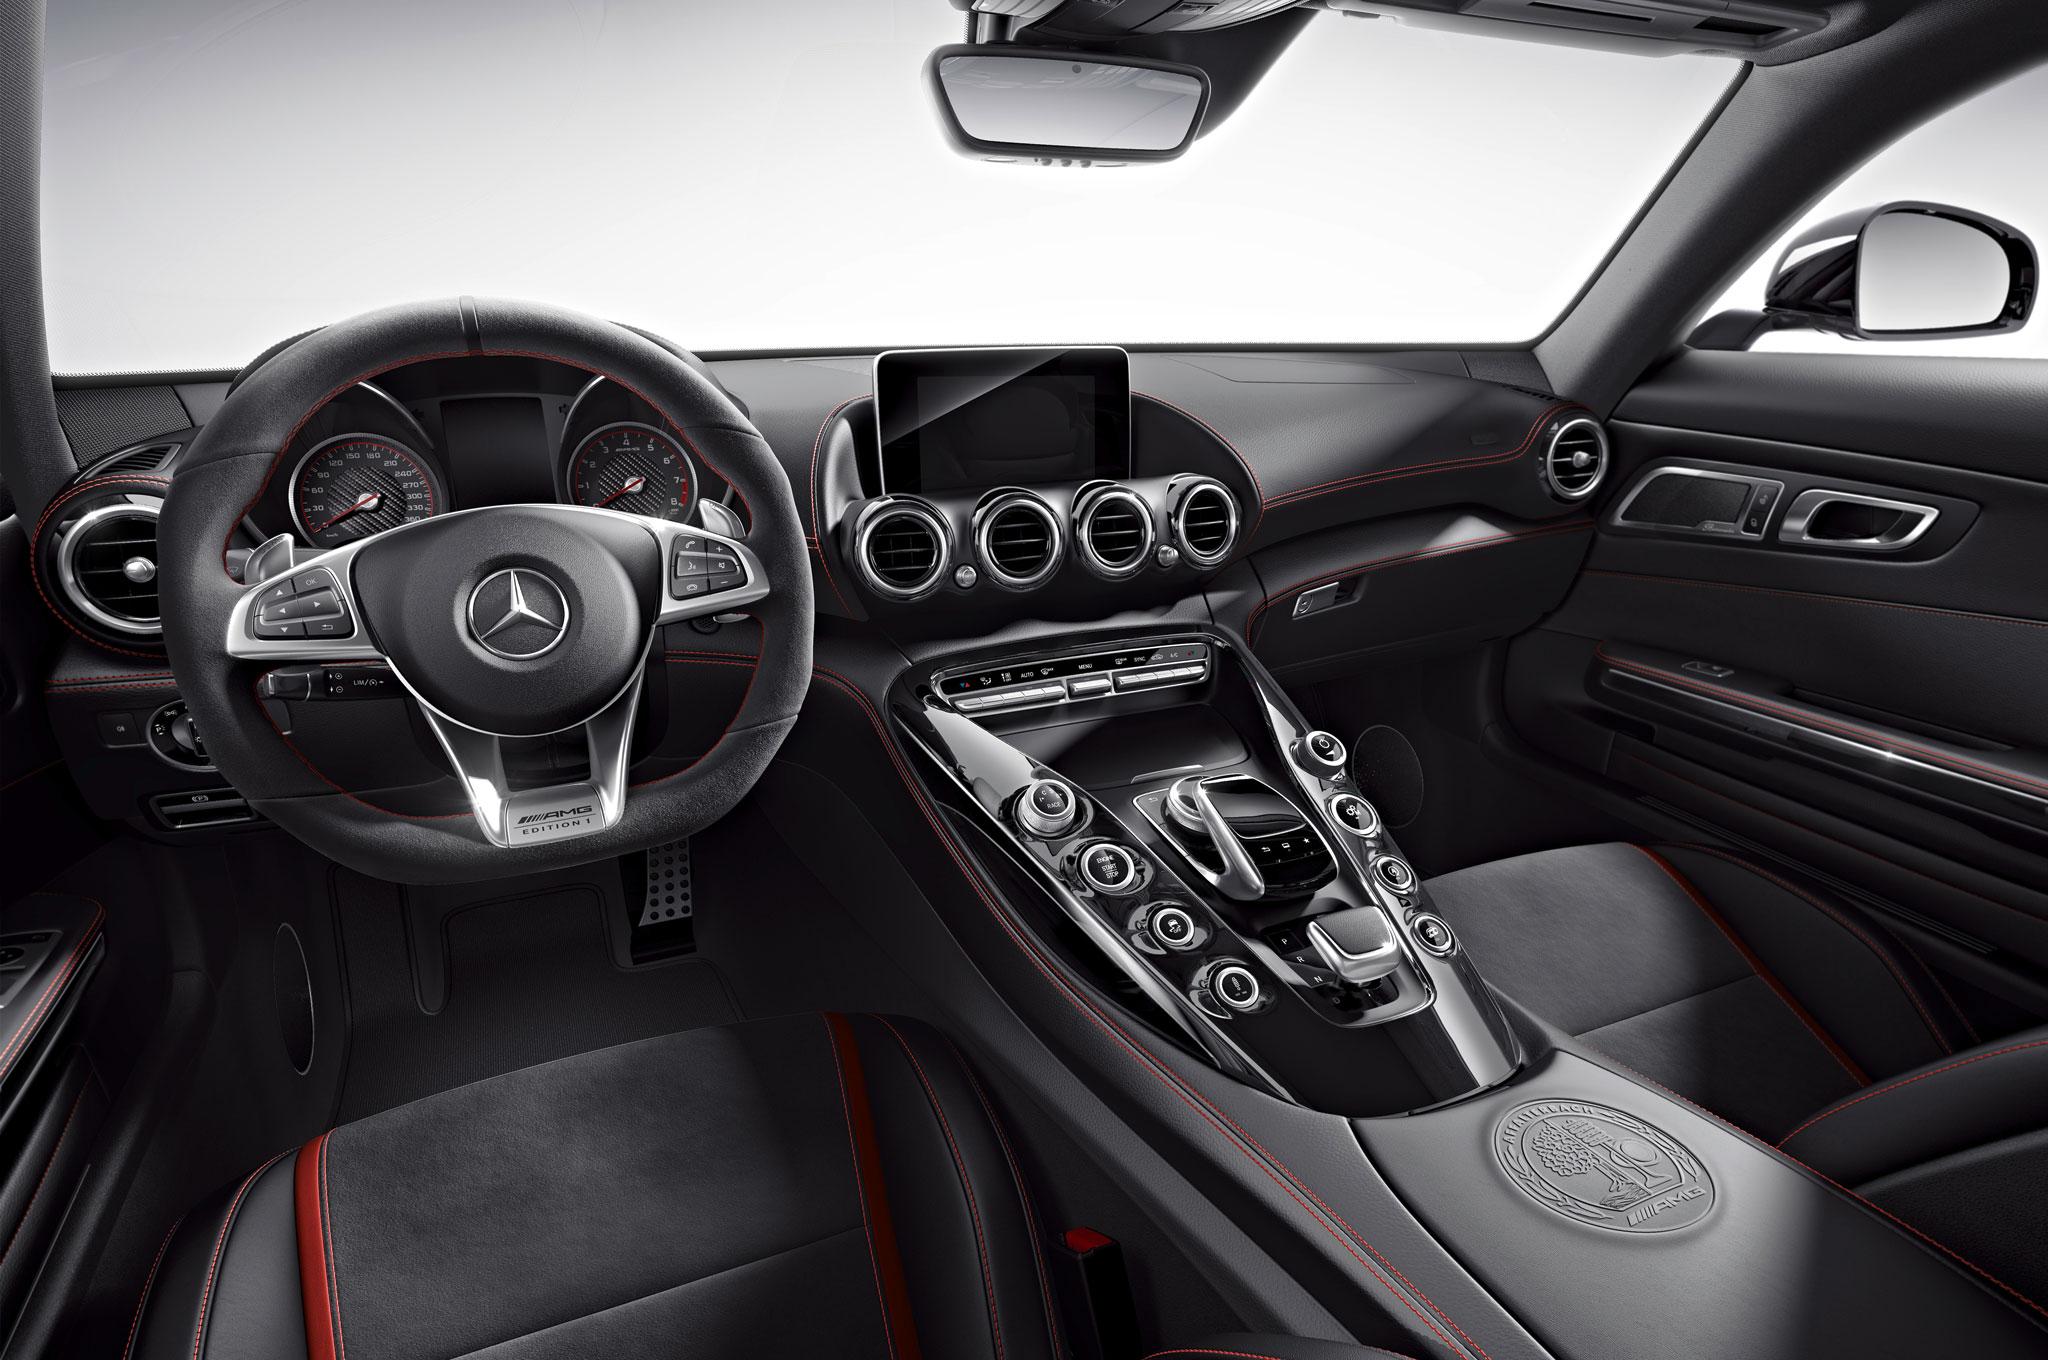 2016 Mercedes-AMG GT Kicks Off with Edition 1 Model | {Auto cockpit mercedes 67}